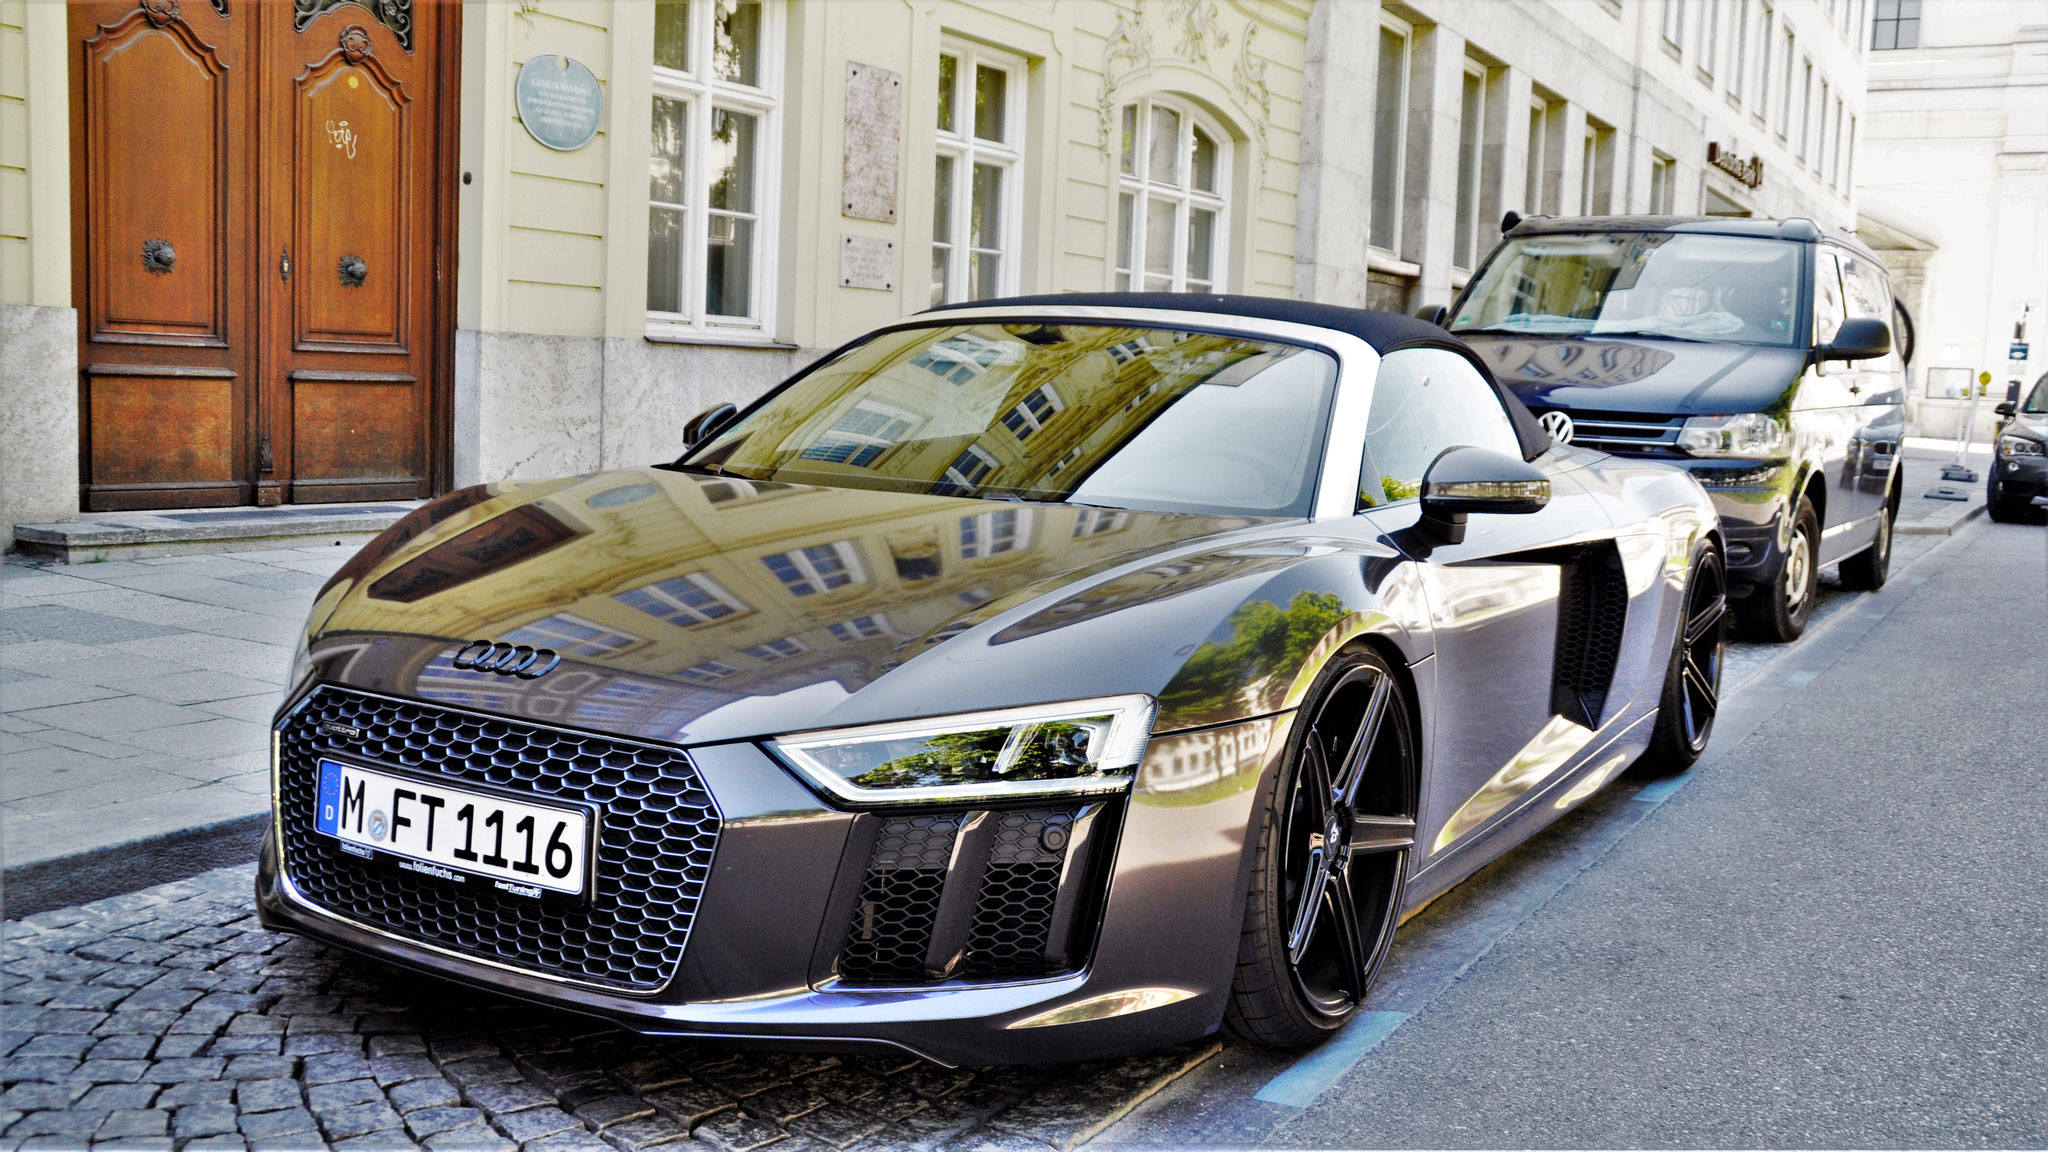 Audi R8 V10 Spyder - M-FT-1116